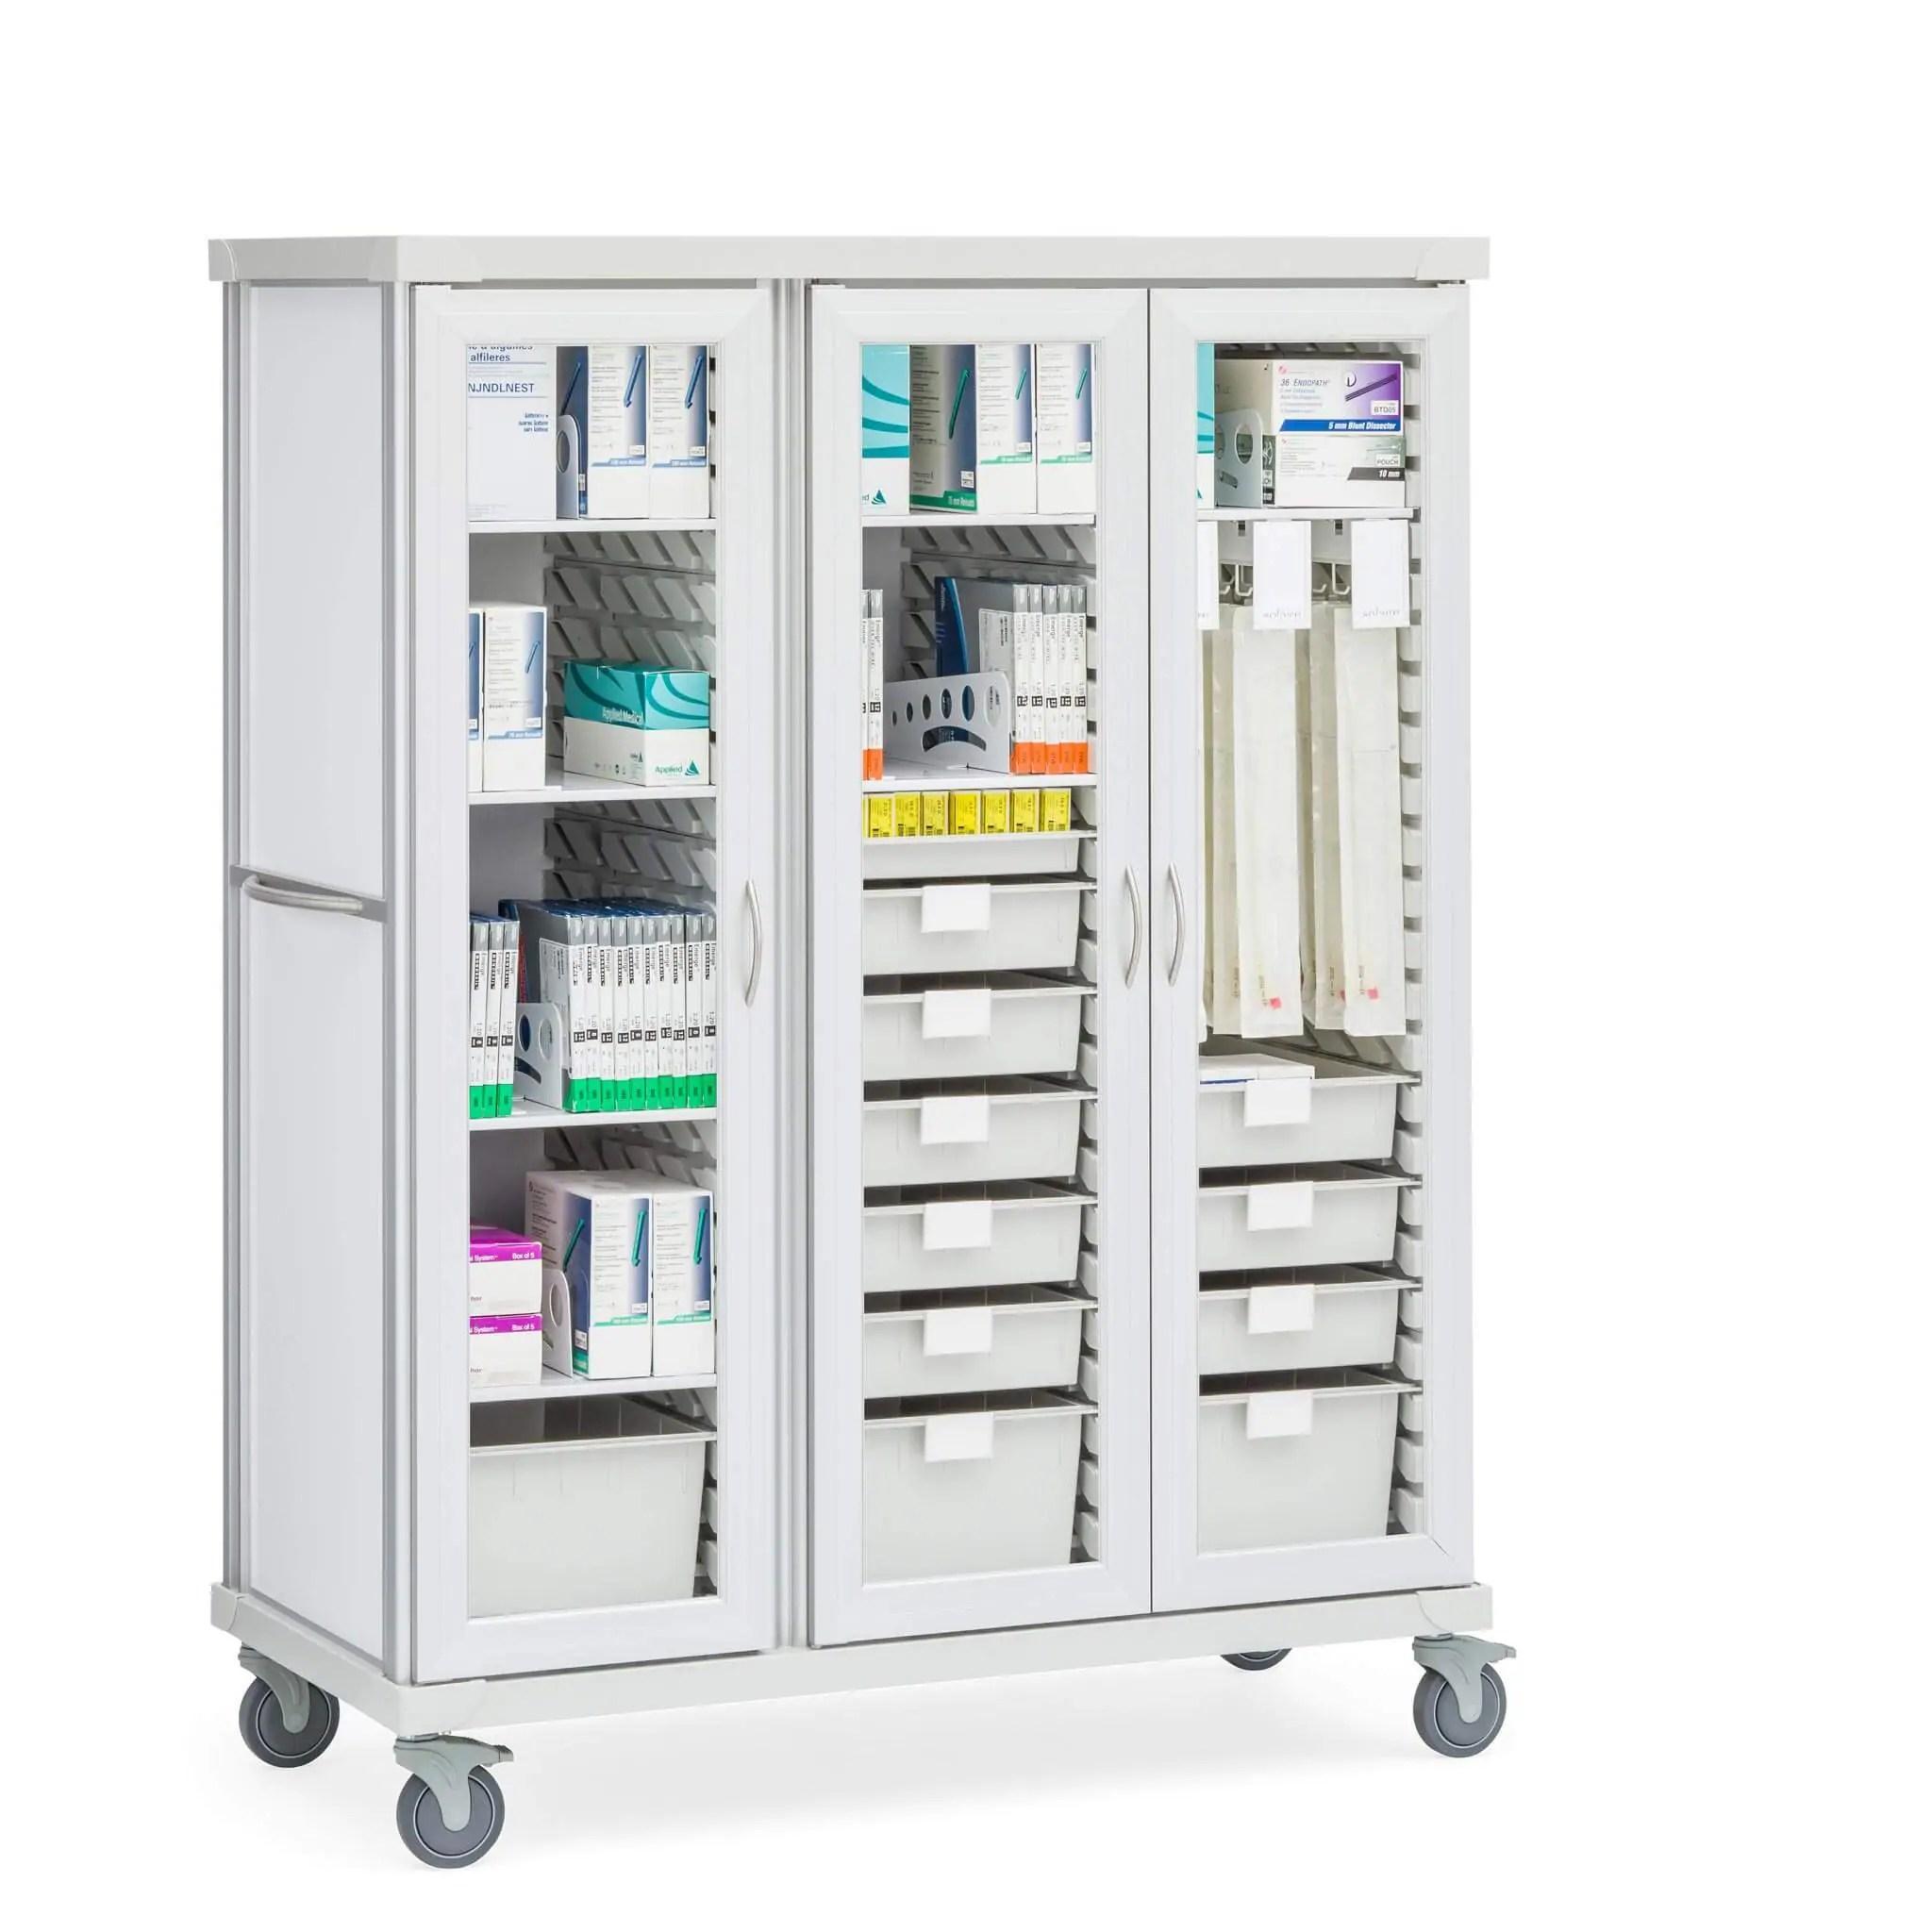 anthro ergonomic verte chair steel price list herman miller medical cabinets used c locker